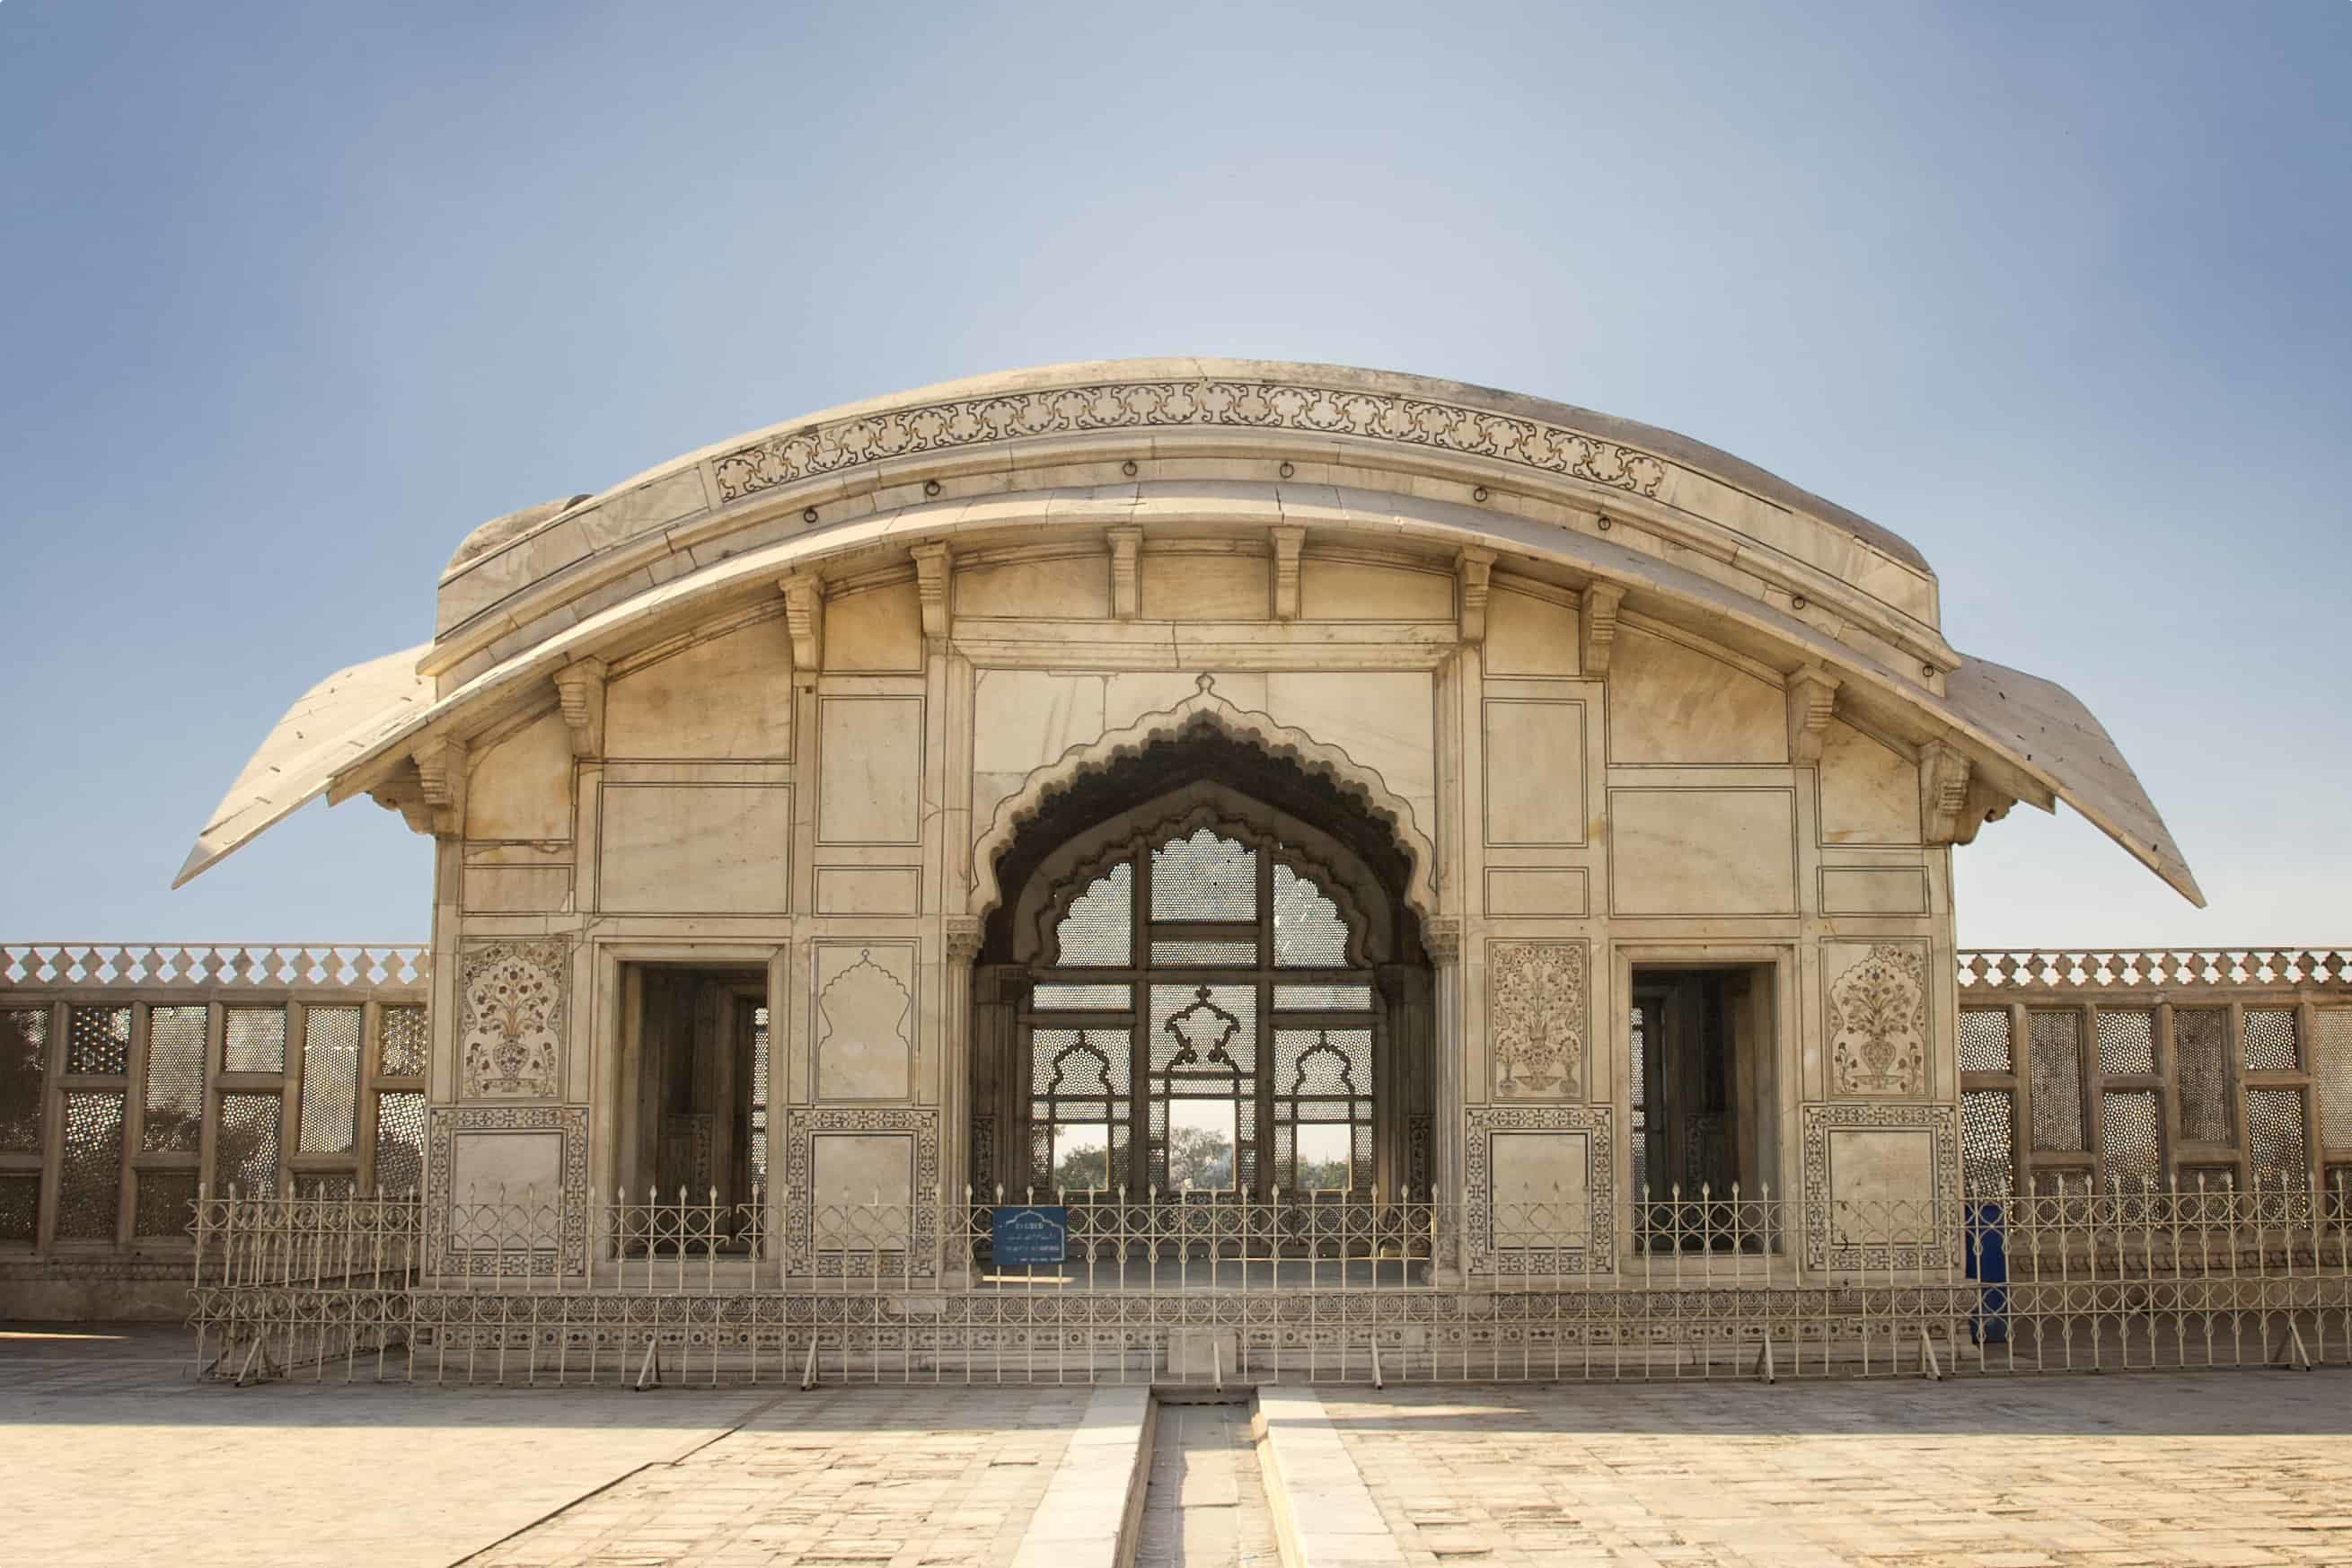 Naulakha Pavilion in Lahore Fort, Lahore, Pakistan